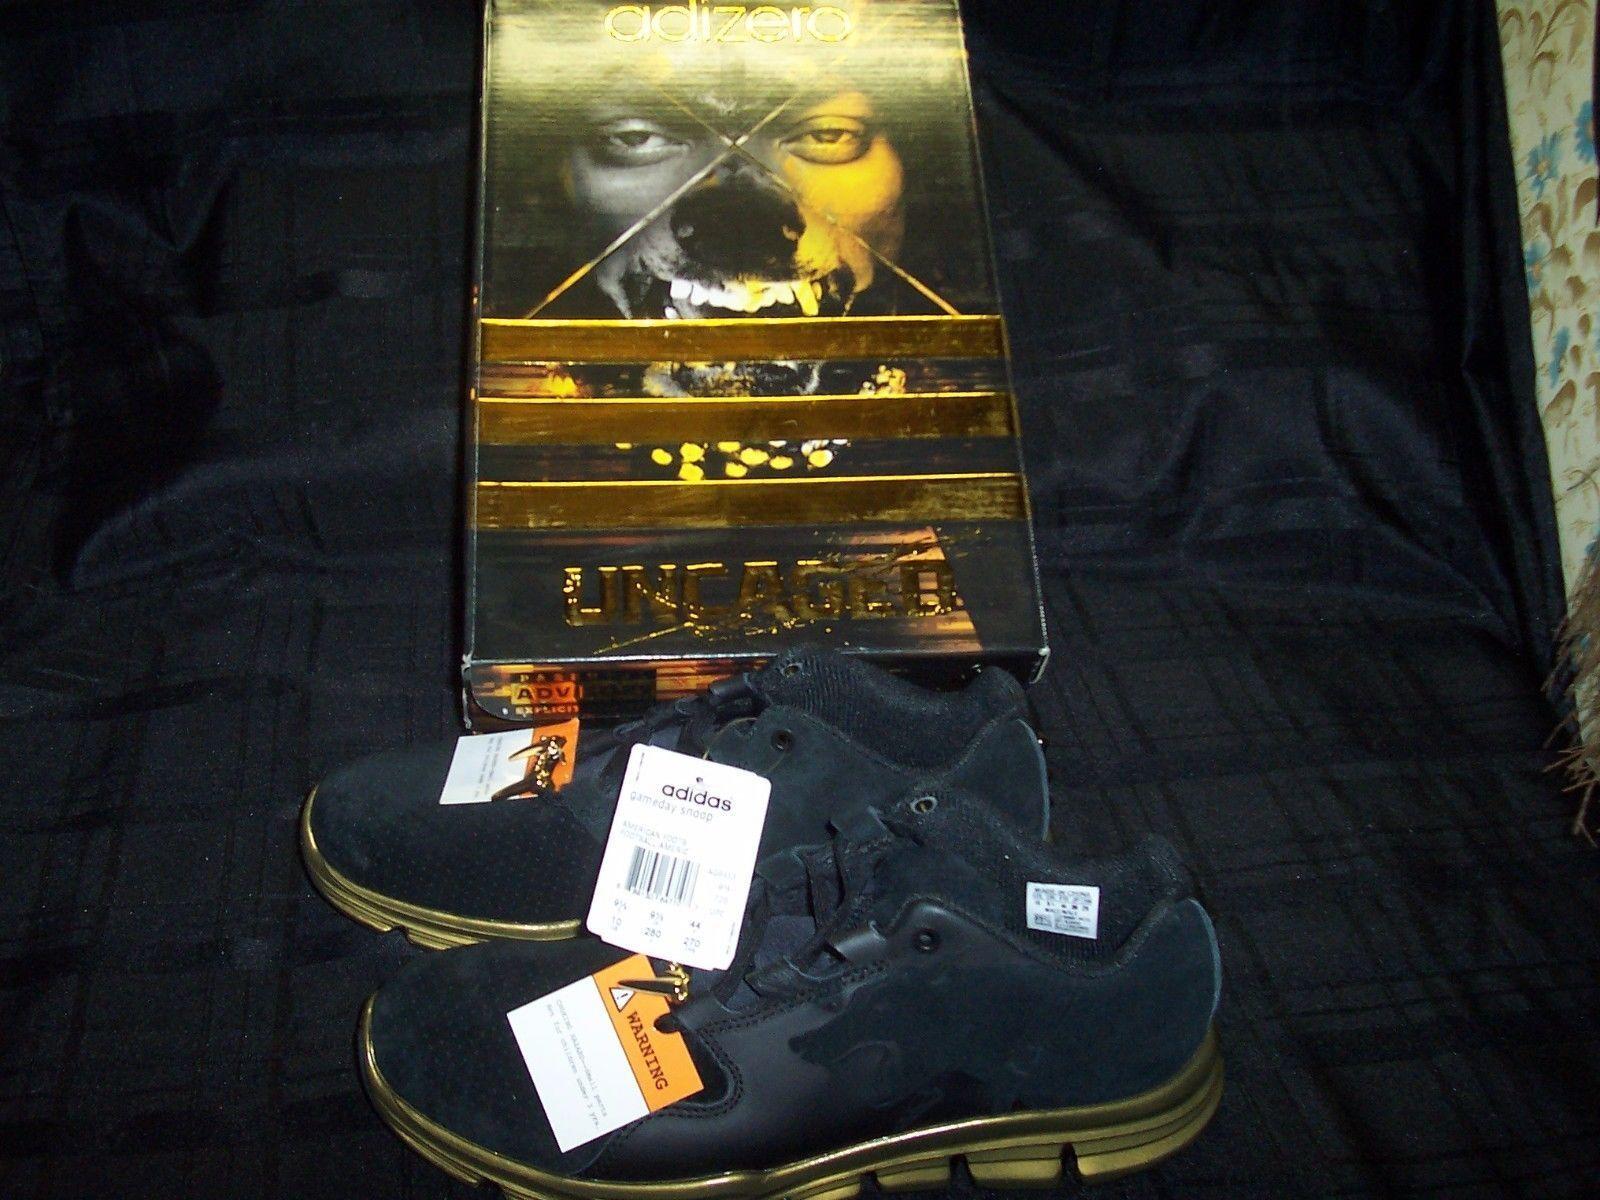 NEW Adidas Gameday Snoop Uncaged Men's AQ8453 Training Shoes Black Gold AQ8453 Men's NIB ce23a9